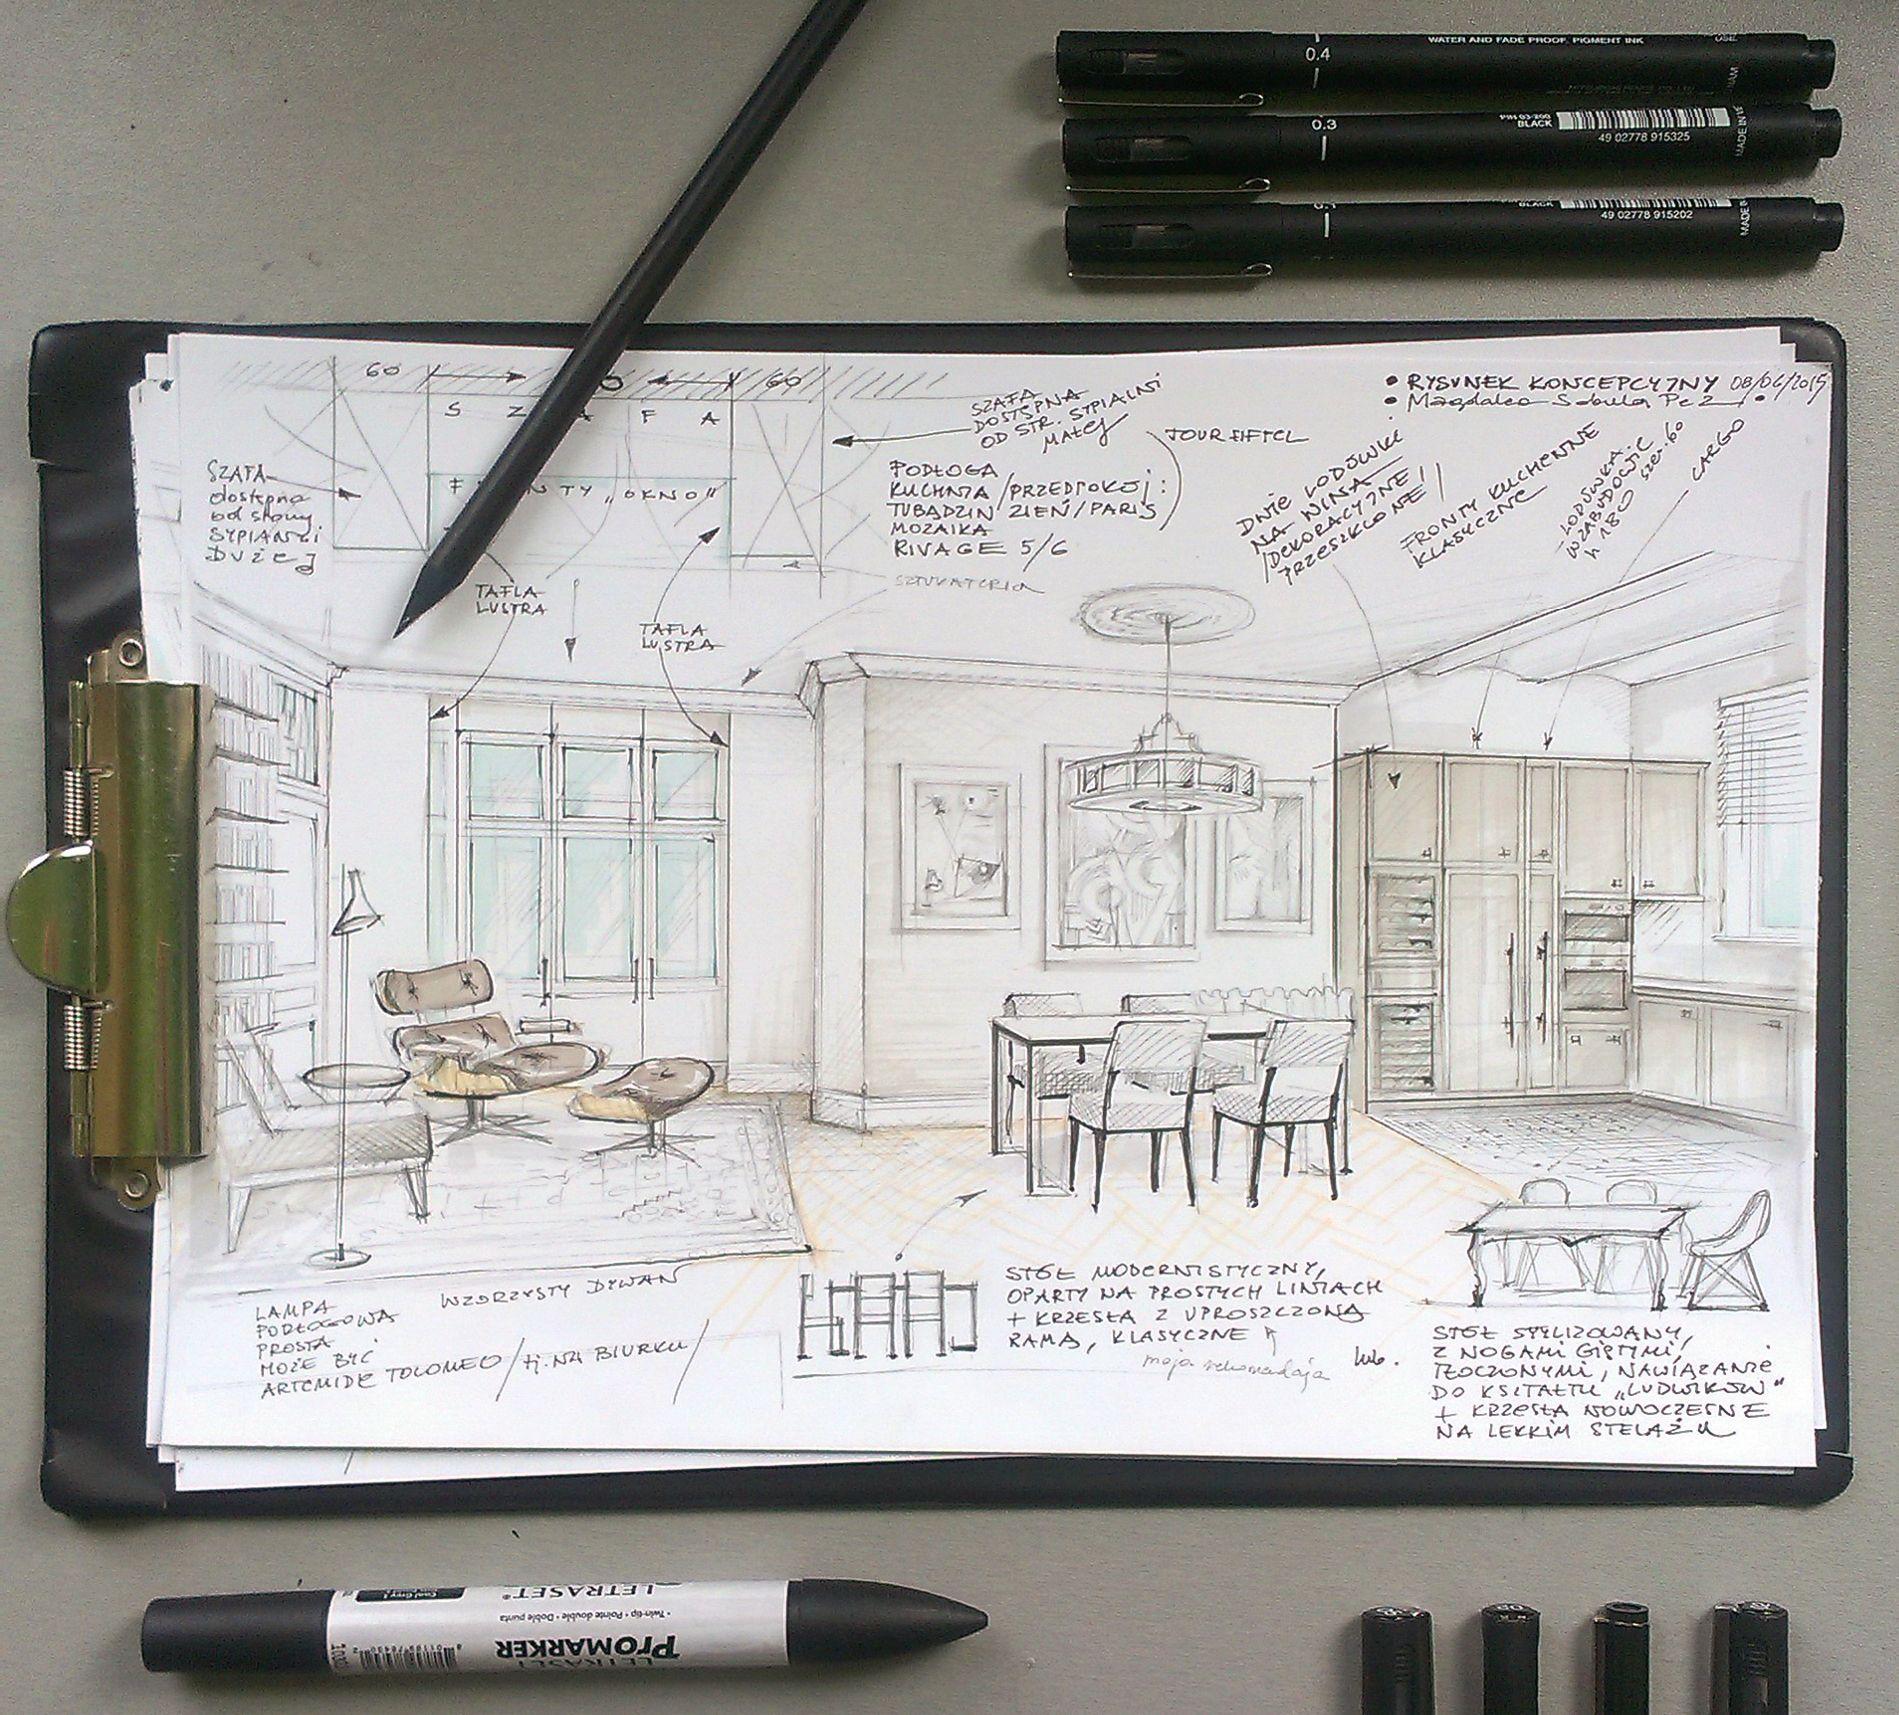 I Love Interior Design how to present a design board to your interior design client